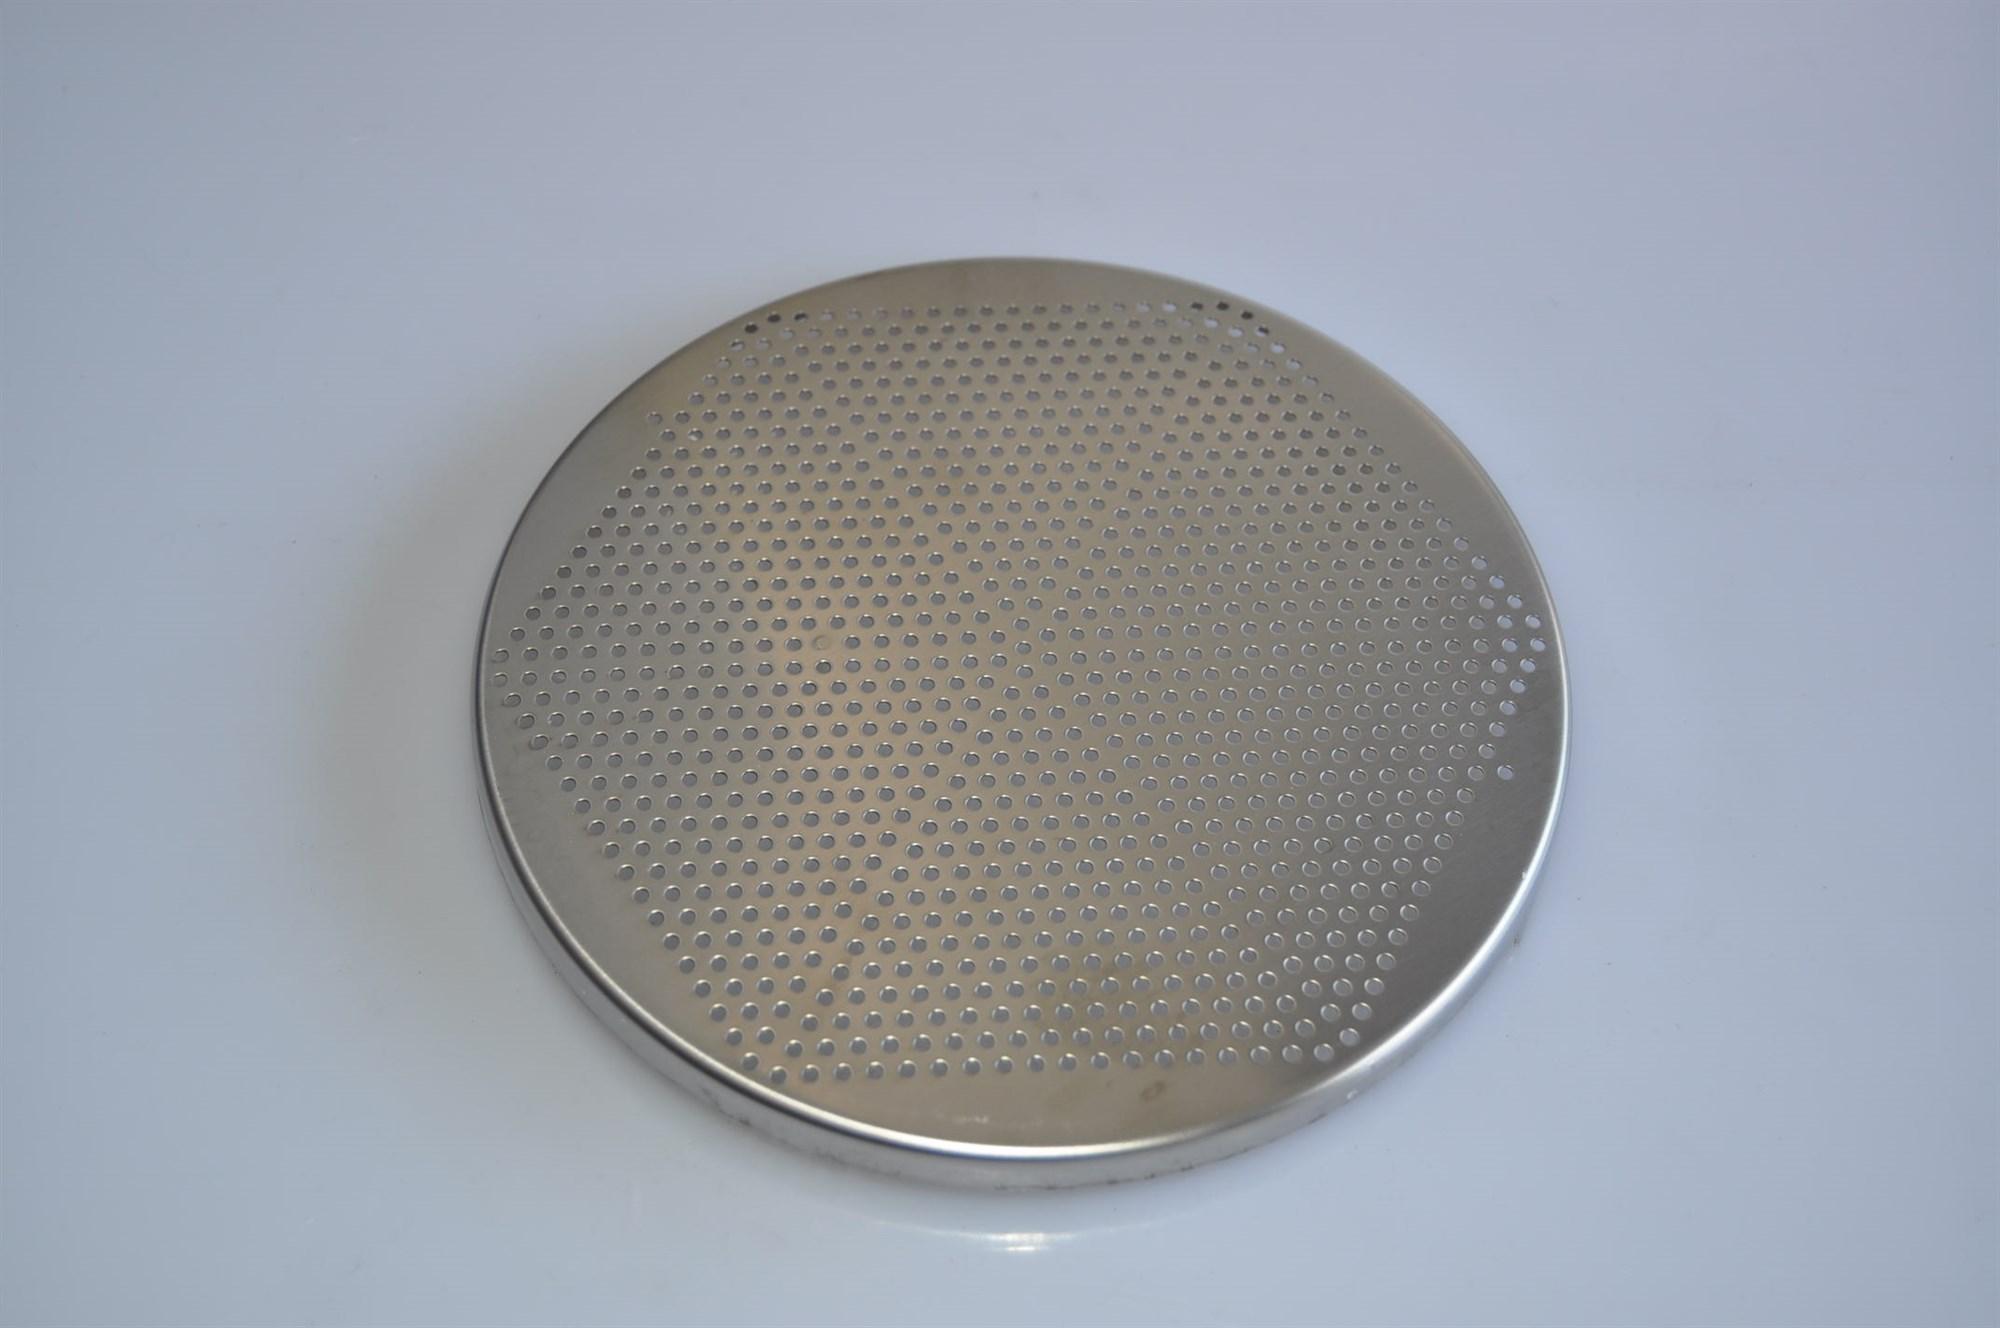 Gorenje Kühlschrank Lüfter : Filter für heißluftherdventilator gorenje herd & backofen